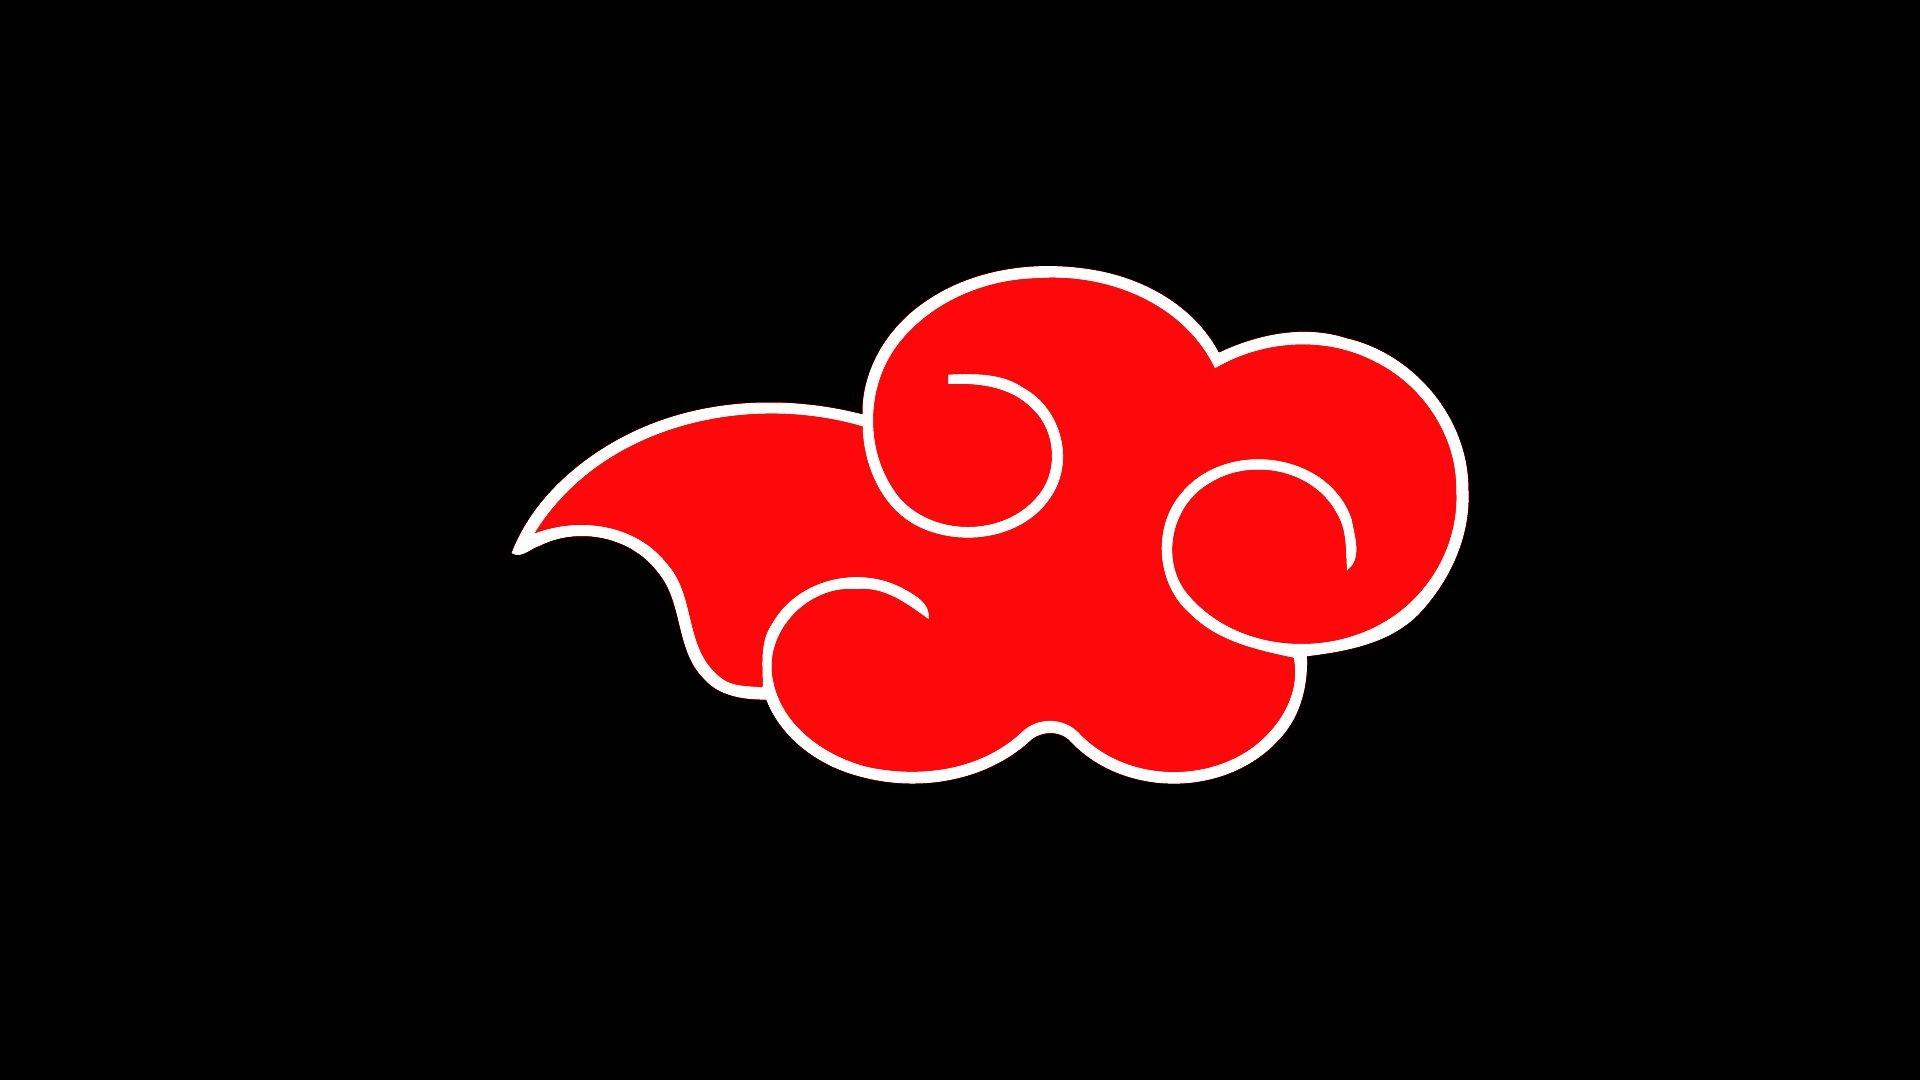 Res: 1920x1080, Explore and share Akatsuki Cloud Wallpaper on WallpaperSafari